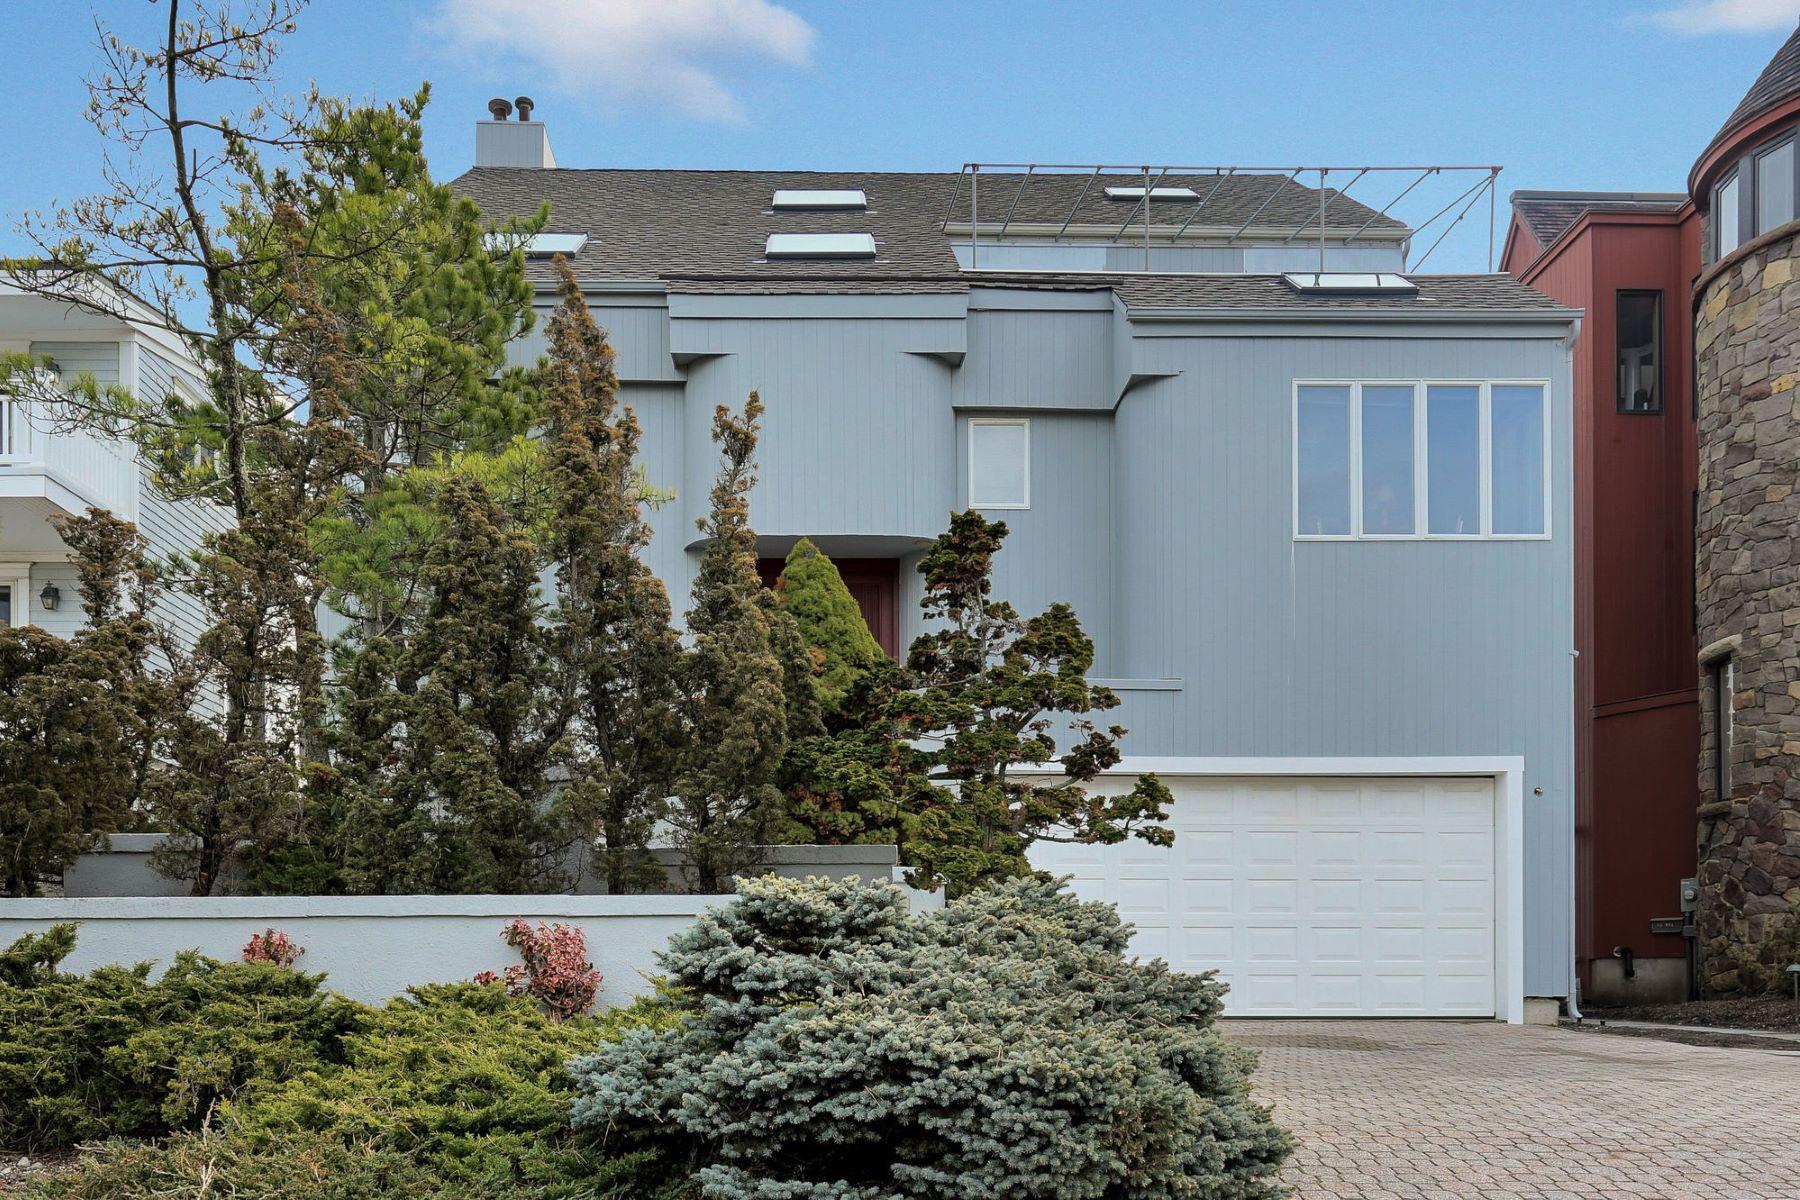 Single Family Homes for Sale at Sea Girt Beachfront 708 Morven Terrace Sea Girt, New Jersey 08750 United States